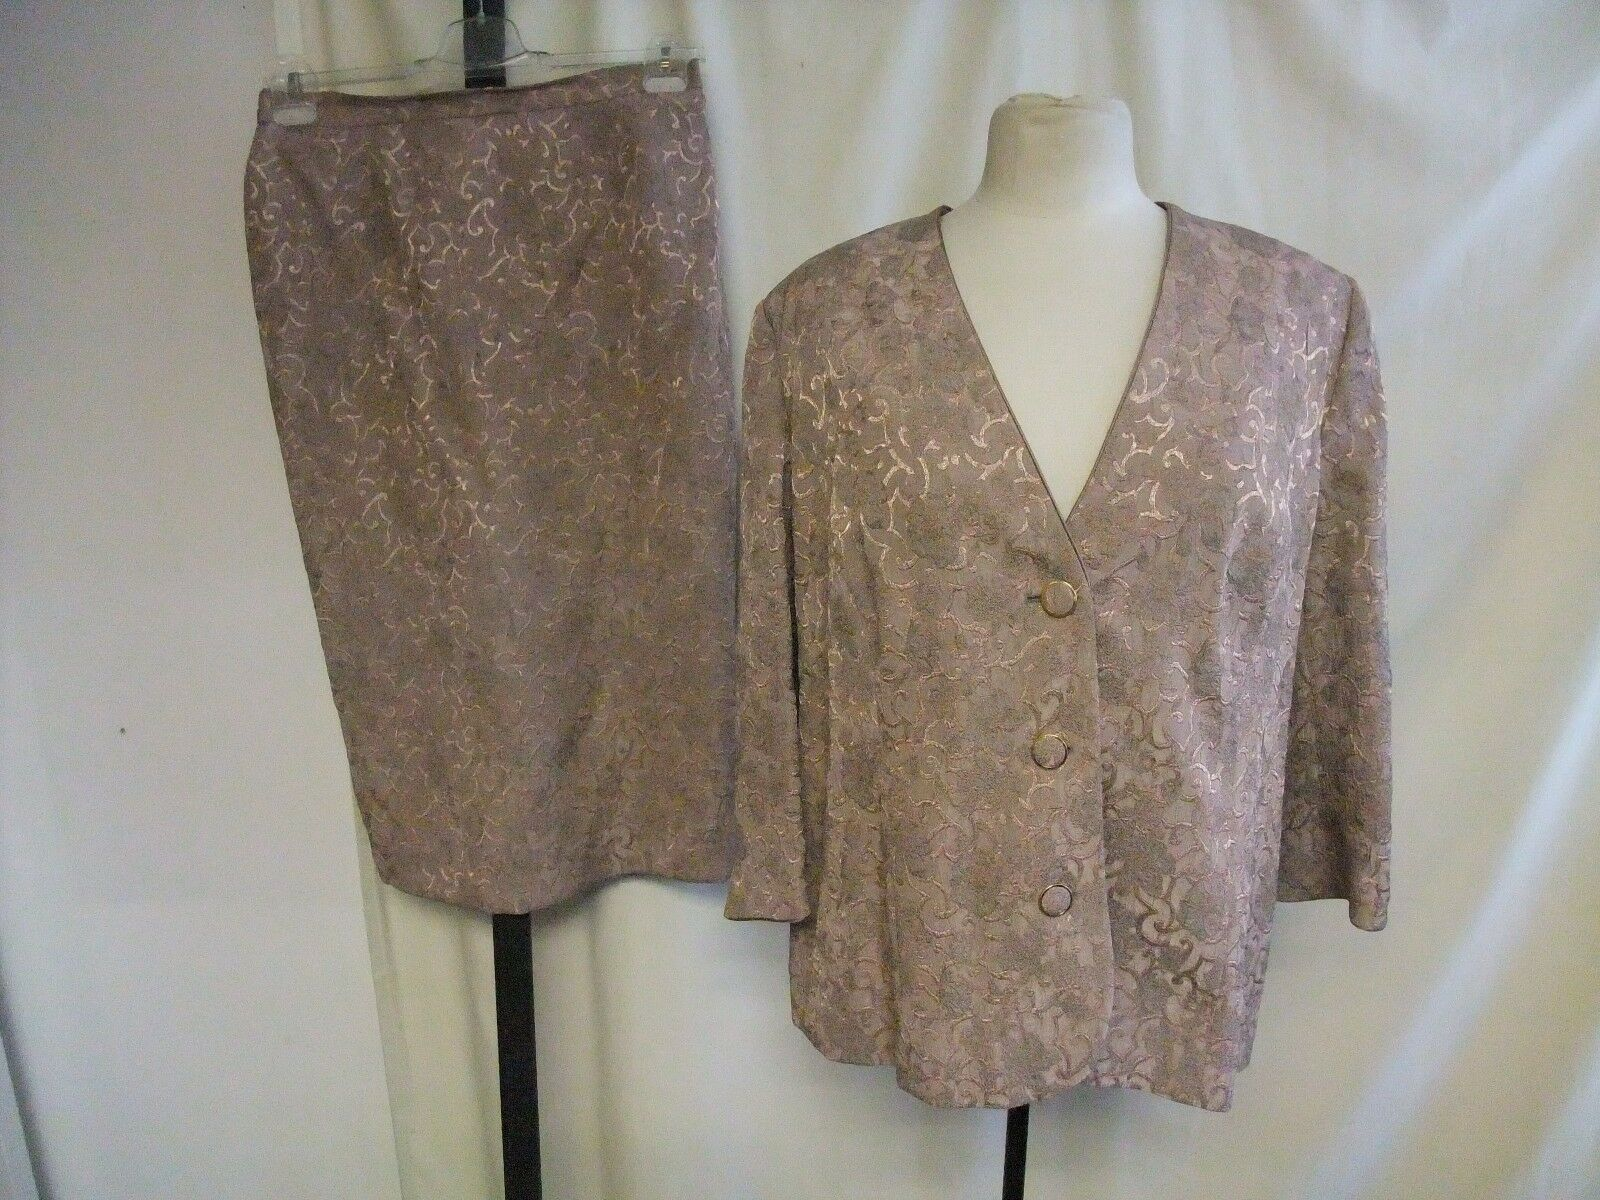 Ladies Skirt Suit size M, pale pink & metallic jacquard viscose mix, lined 1855